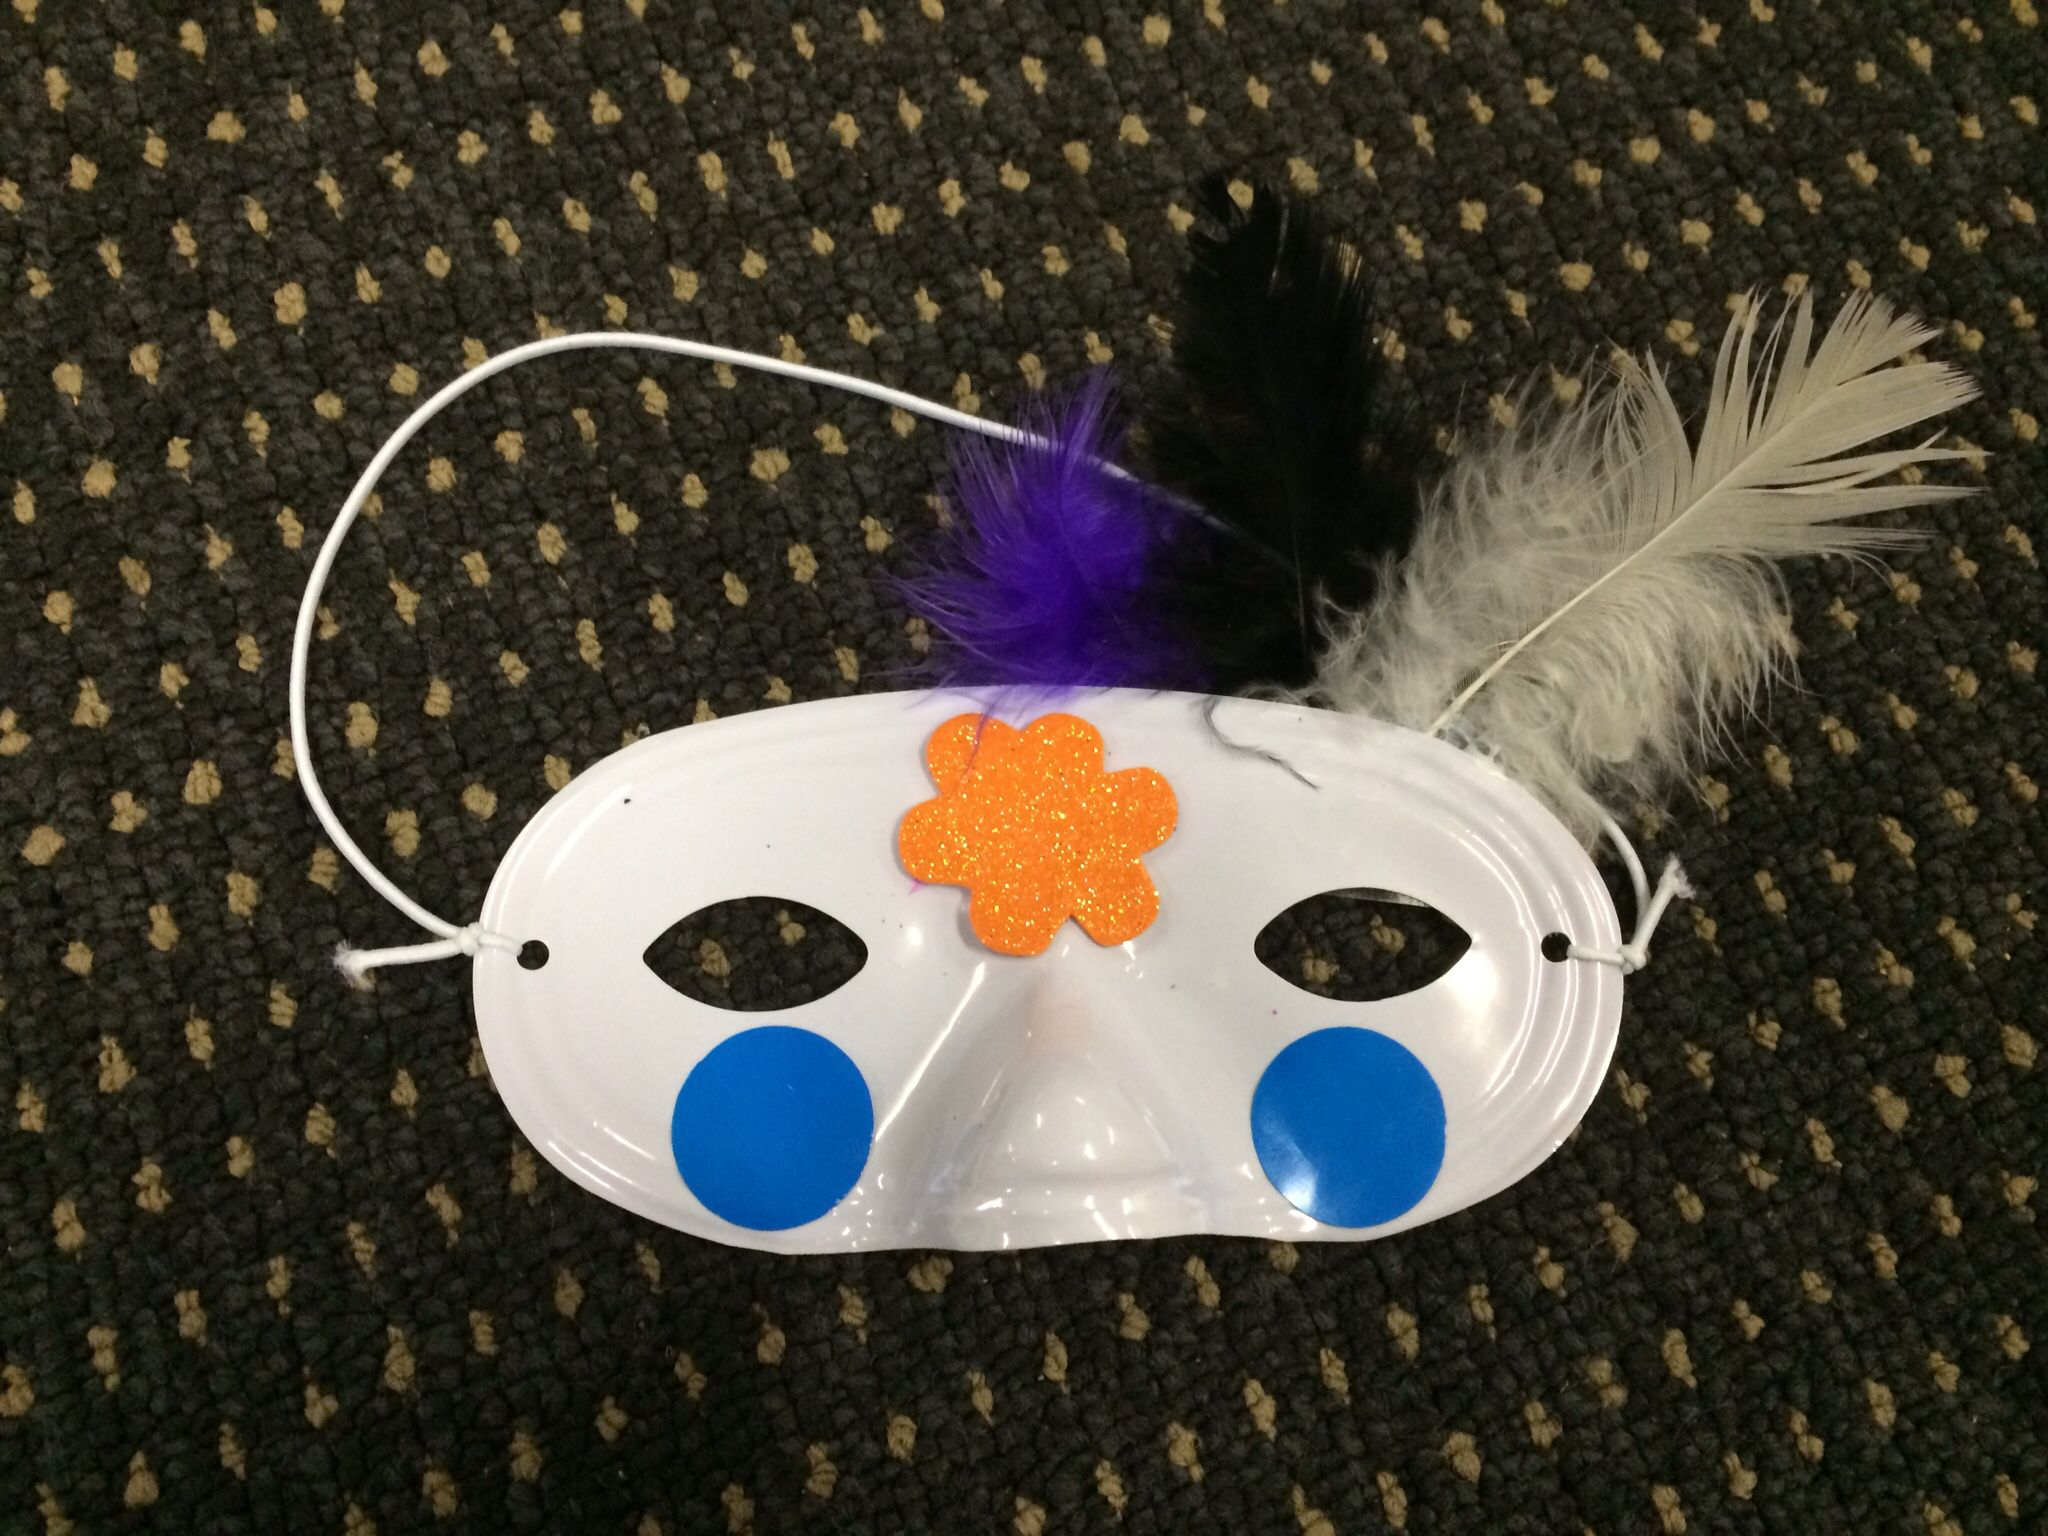 Superhero Masks To Decorate Gorgeous Superhero Playgroup Craft Madedecorating Masks With Stickers Design Ideas